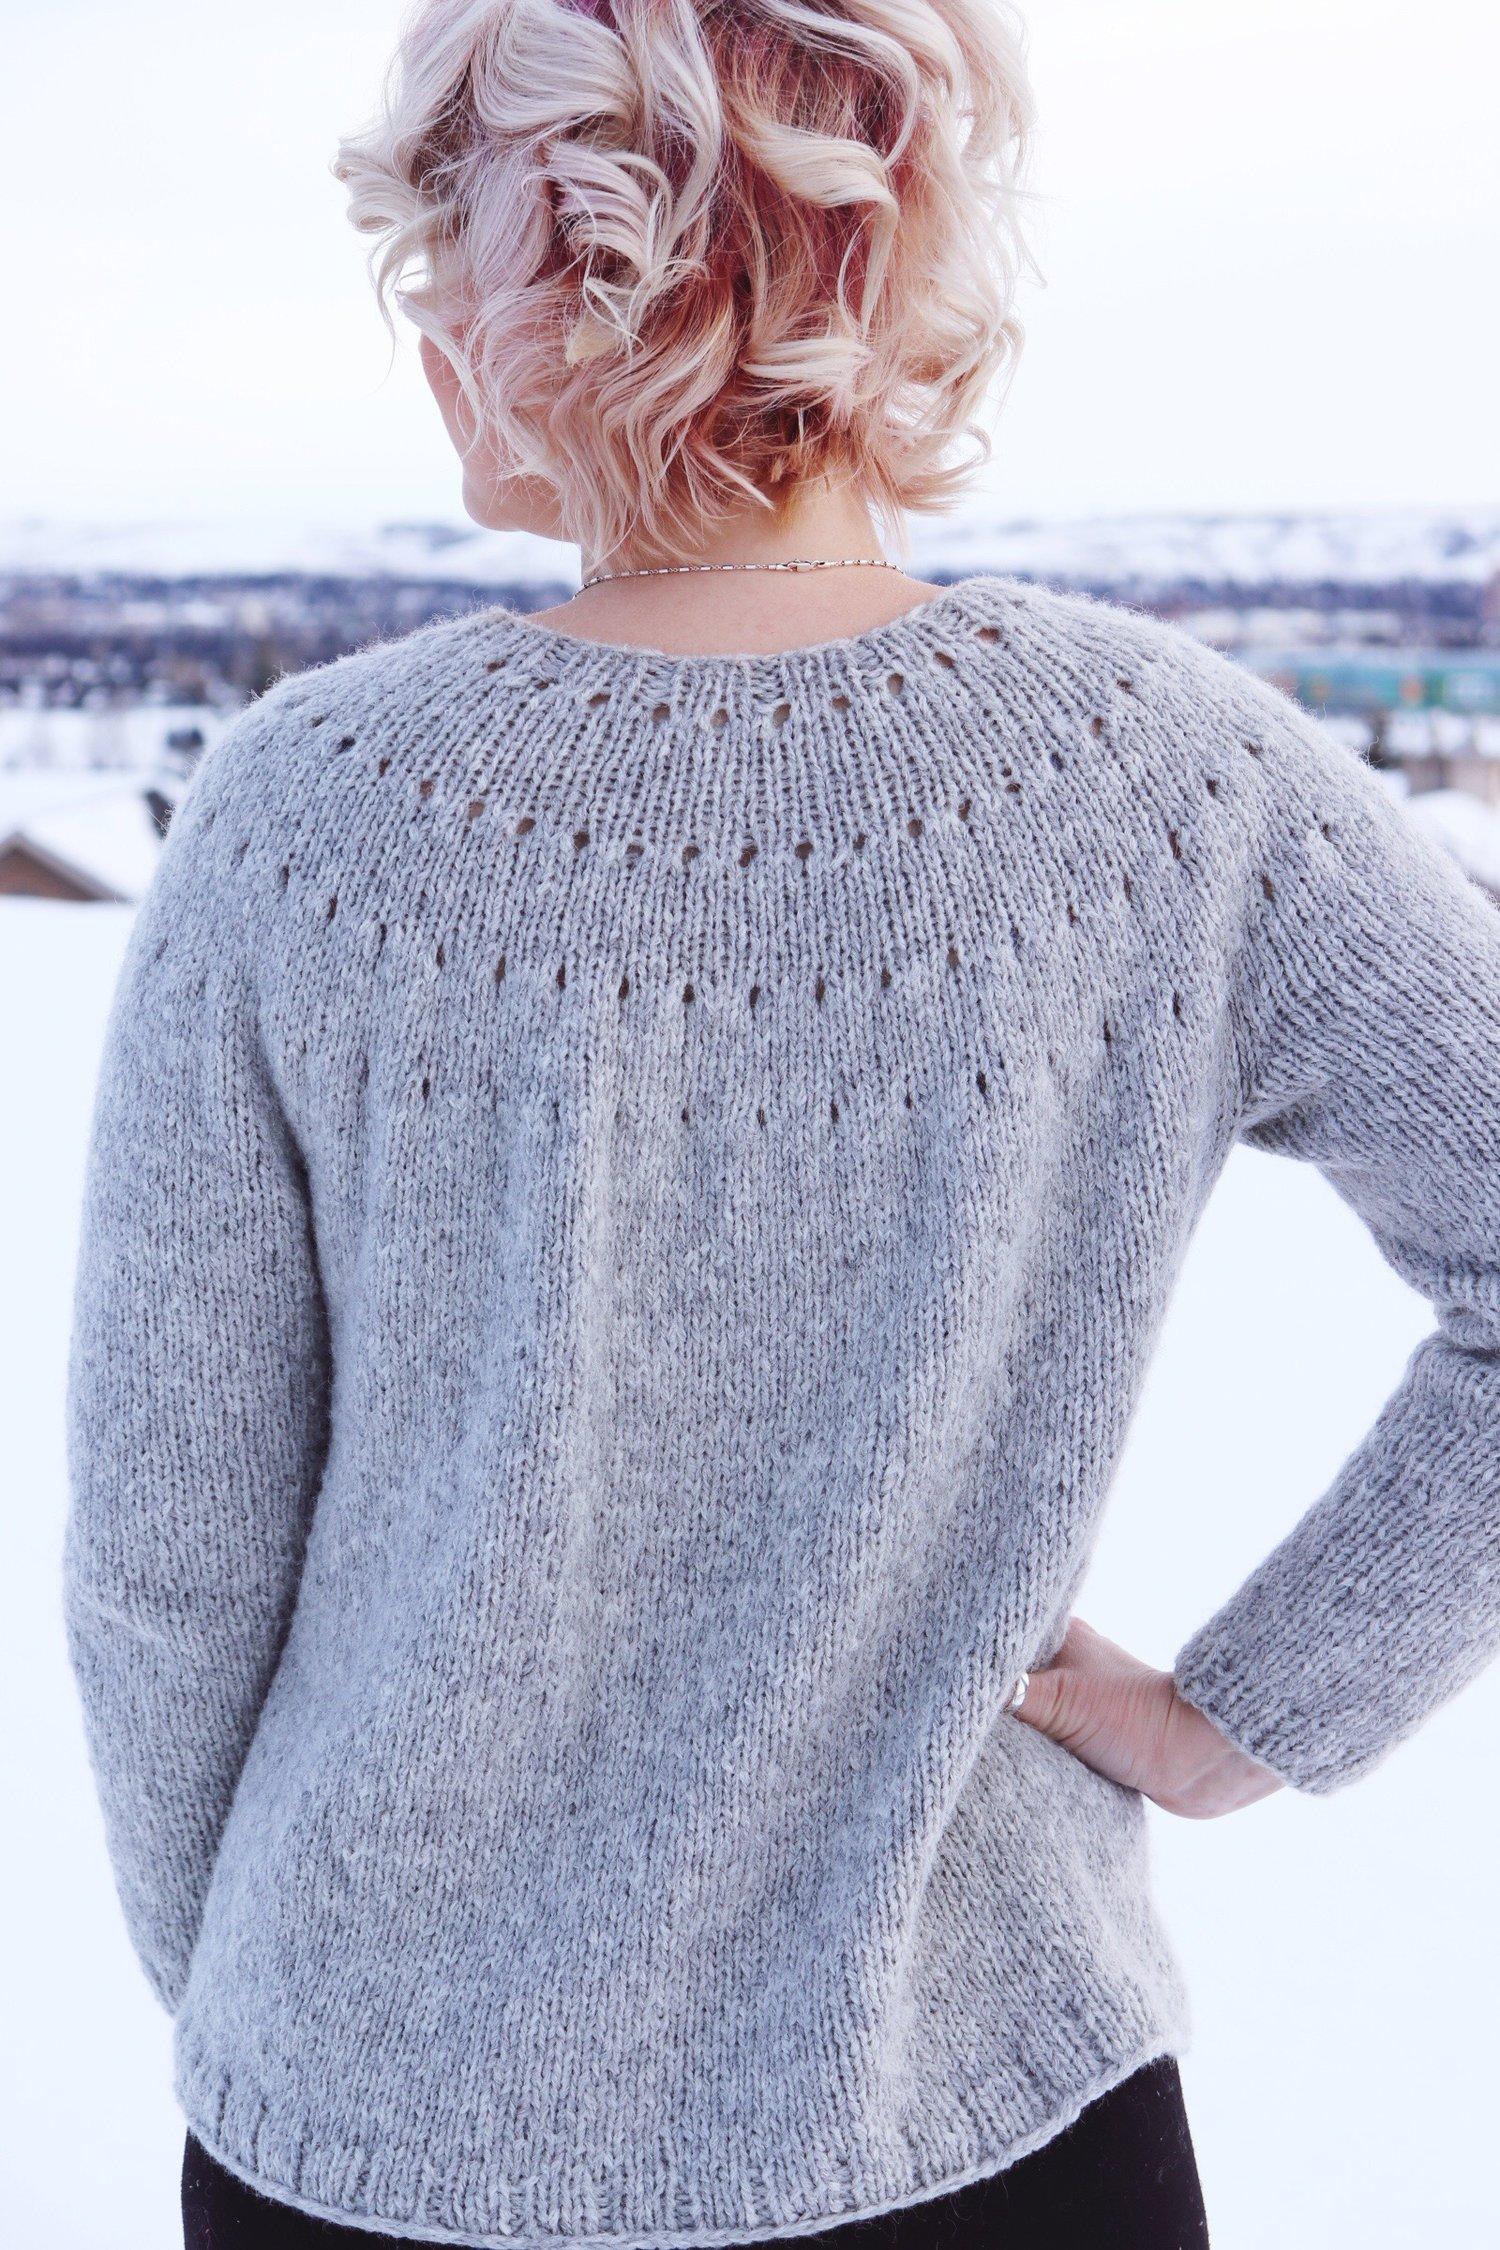 Knitting A Top Down Yoke Sweater The Easy Eyelet Yoke